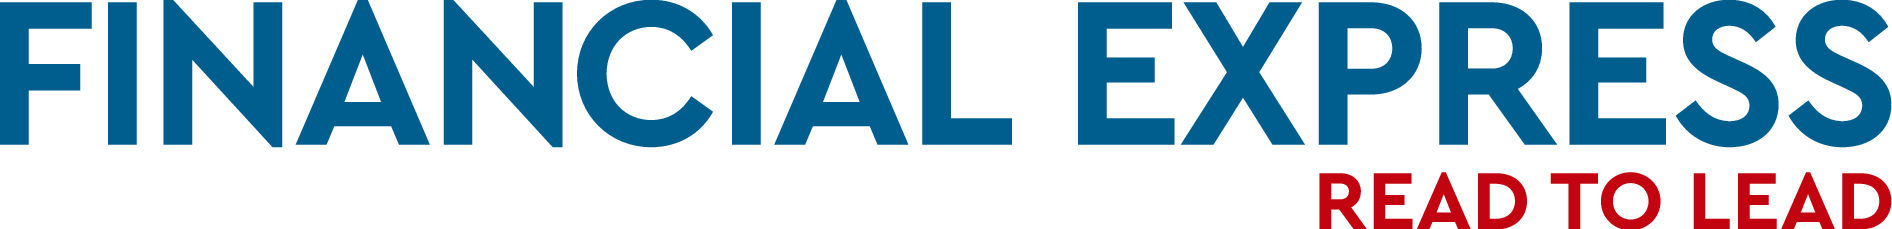 financia-express-logo.jpg